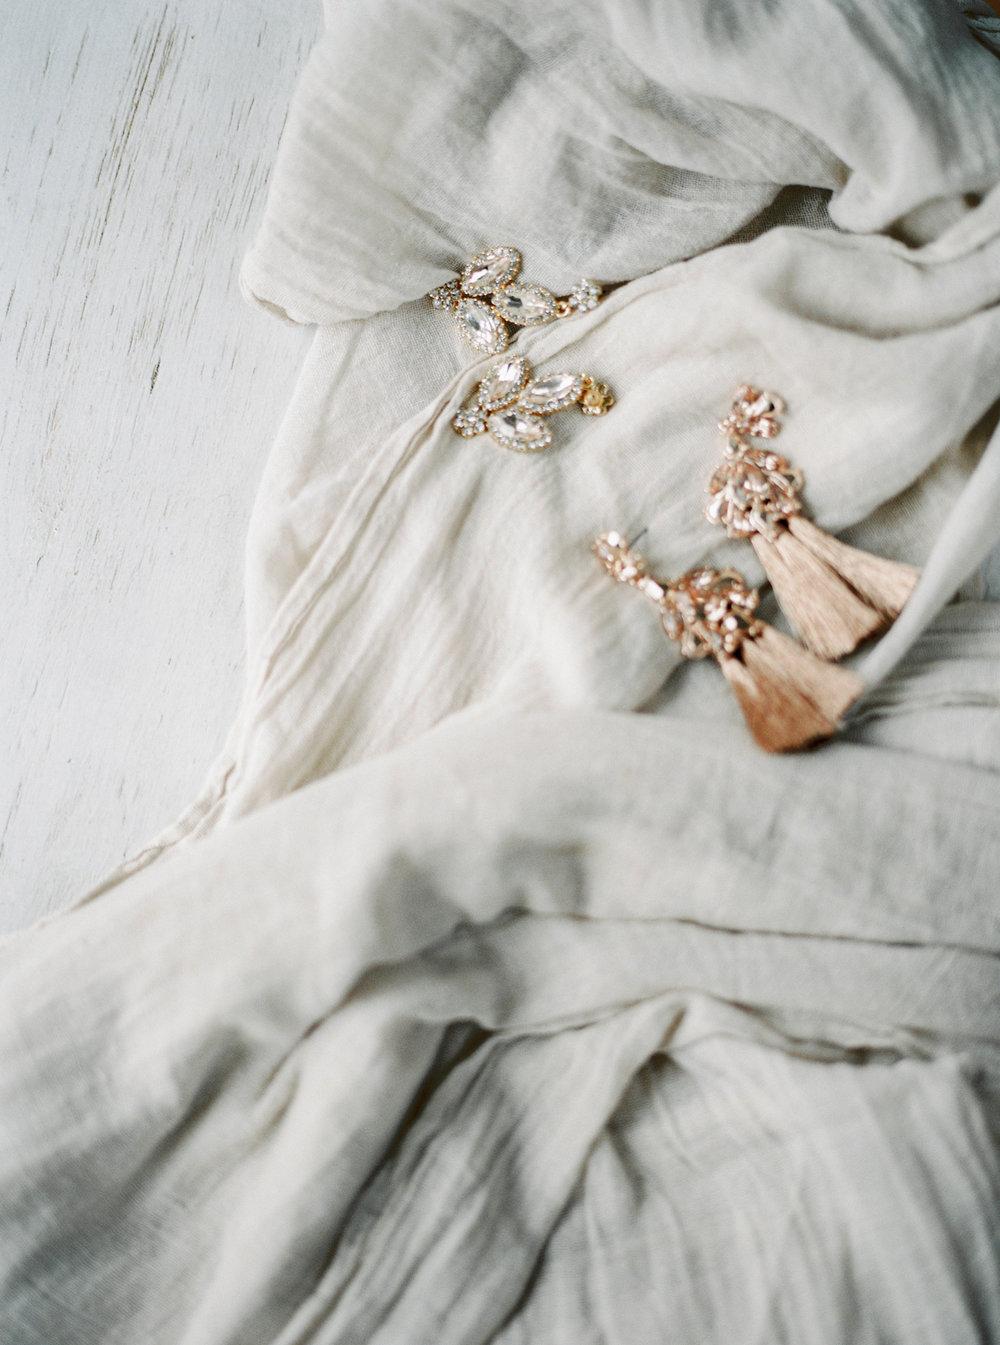 Luxury Wedding Planner UK | Our Chic & Romantic Engagement Shoot in Bath | Katie Julia Photography - 100.JPG